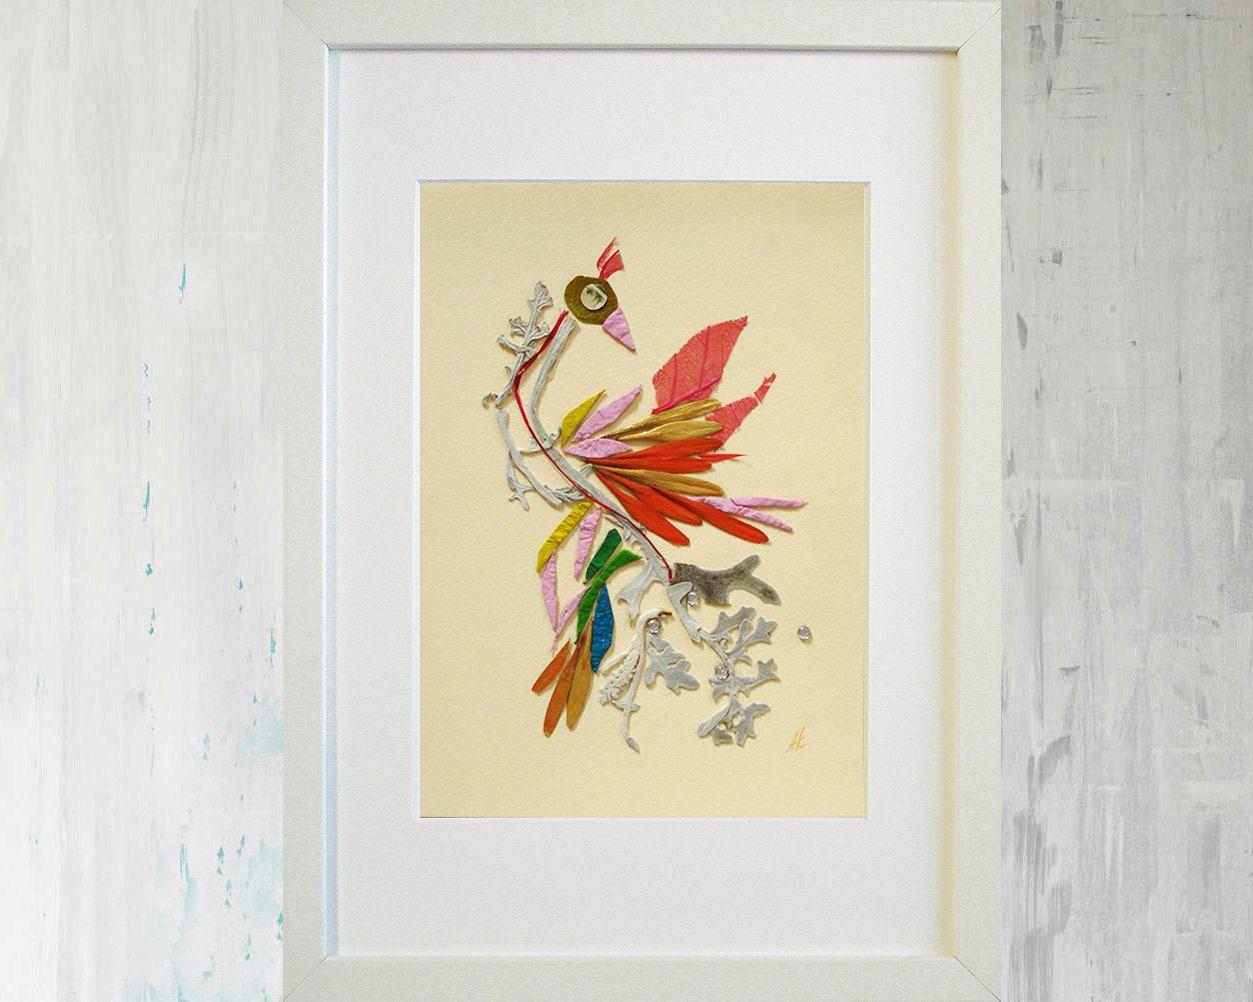 Dried Flowers Art Bird Original Botanical Artwork Mixed Media Collage Framed Decorative Living